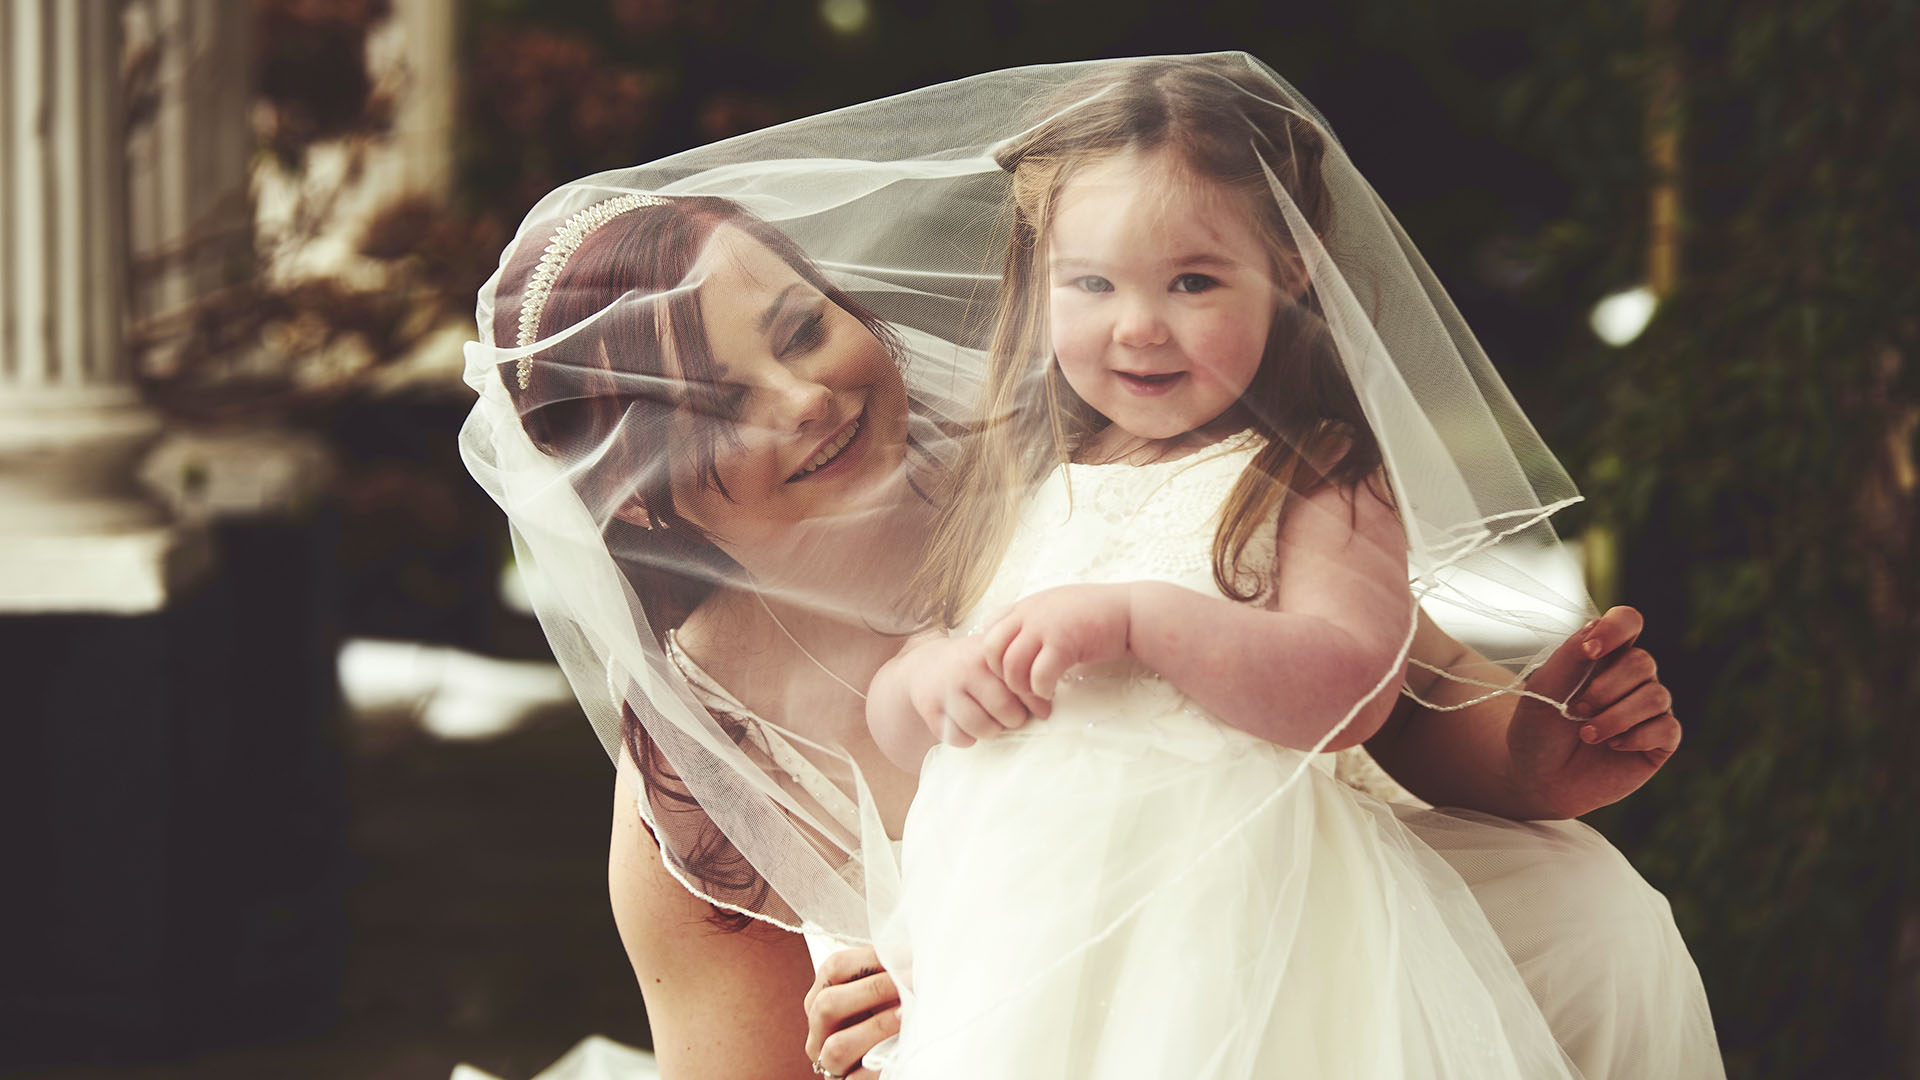 Bride & Her Flowergirl - Winter Wedding at Ringwood Hall Hotel, Chesterfield, Derbyshire - Wedding Photographer